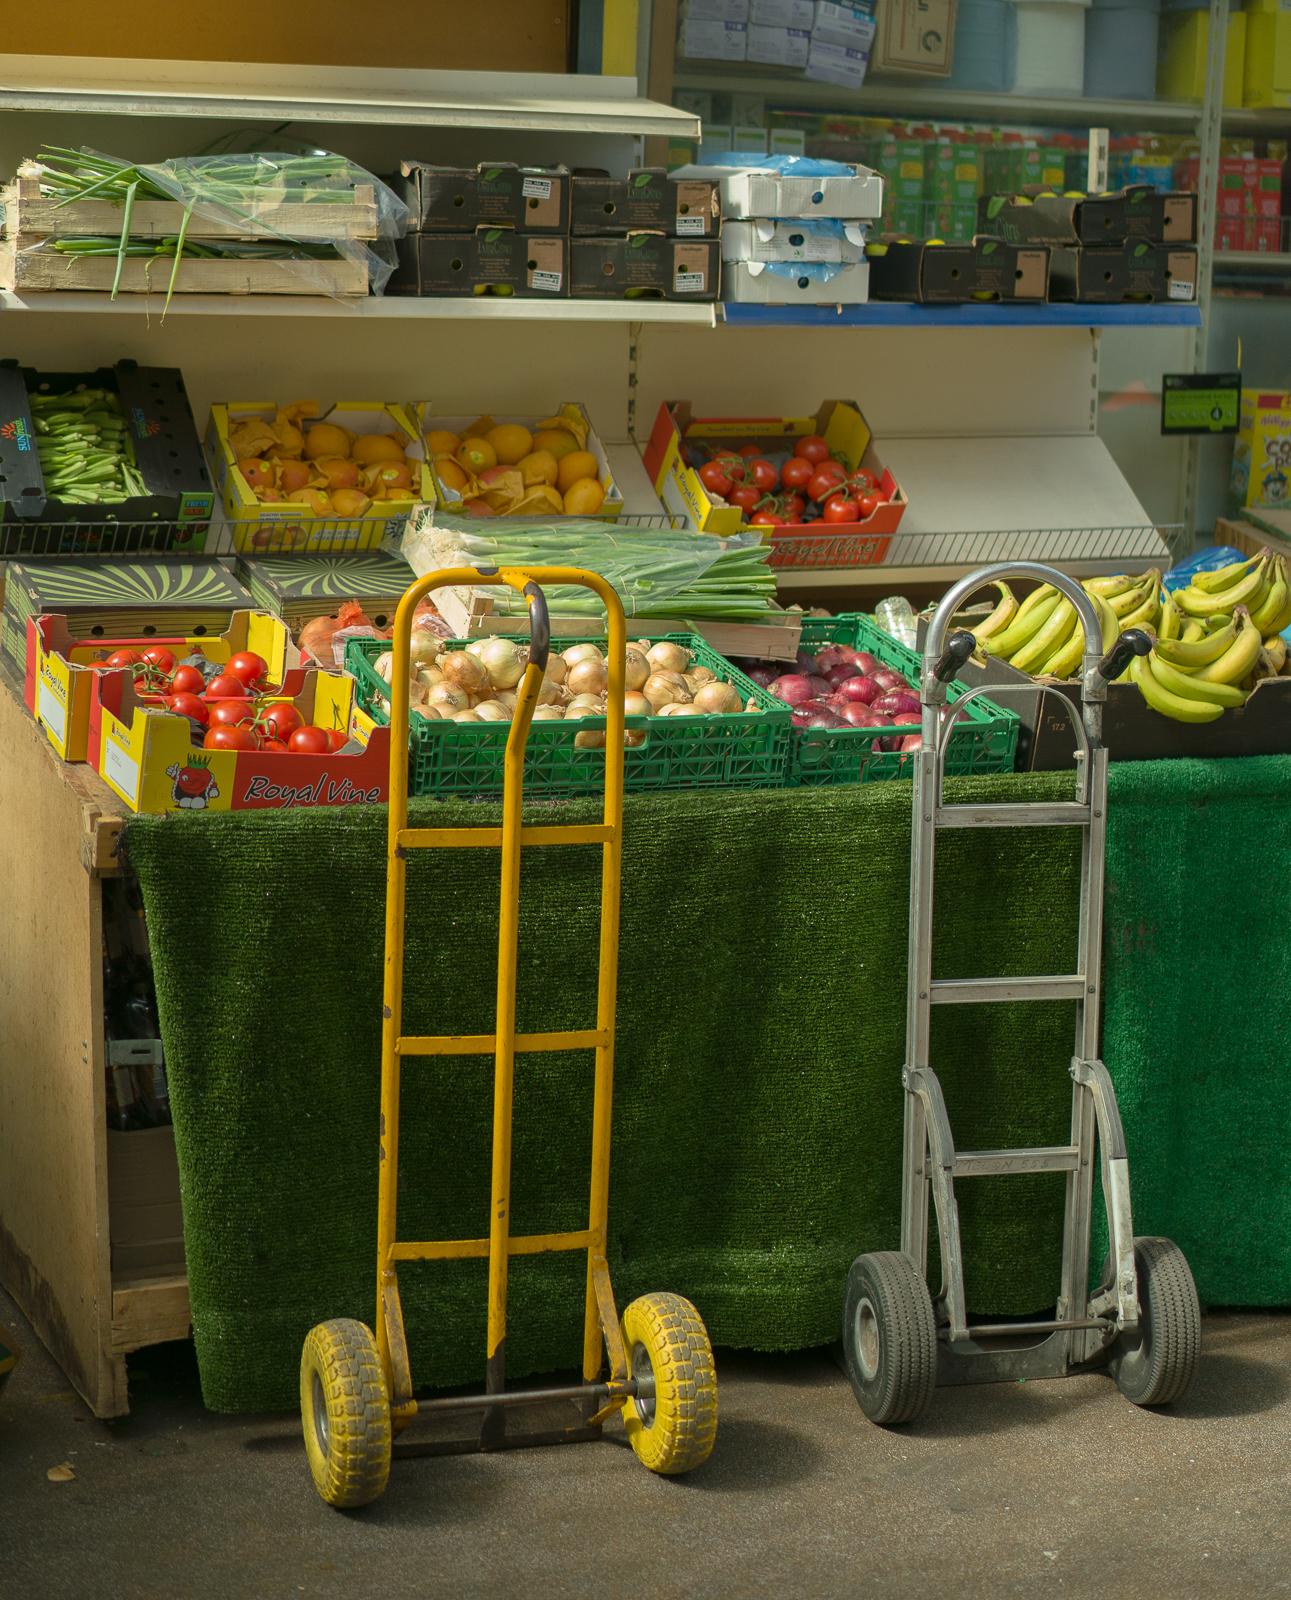 brixtonmarketjuly2019-3.jpg